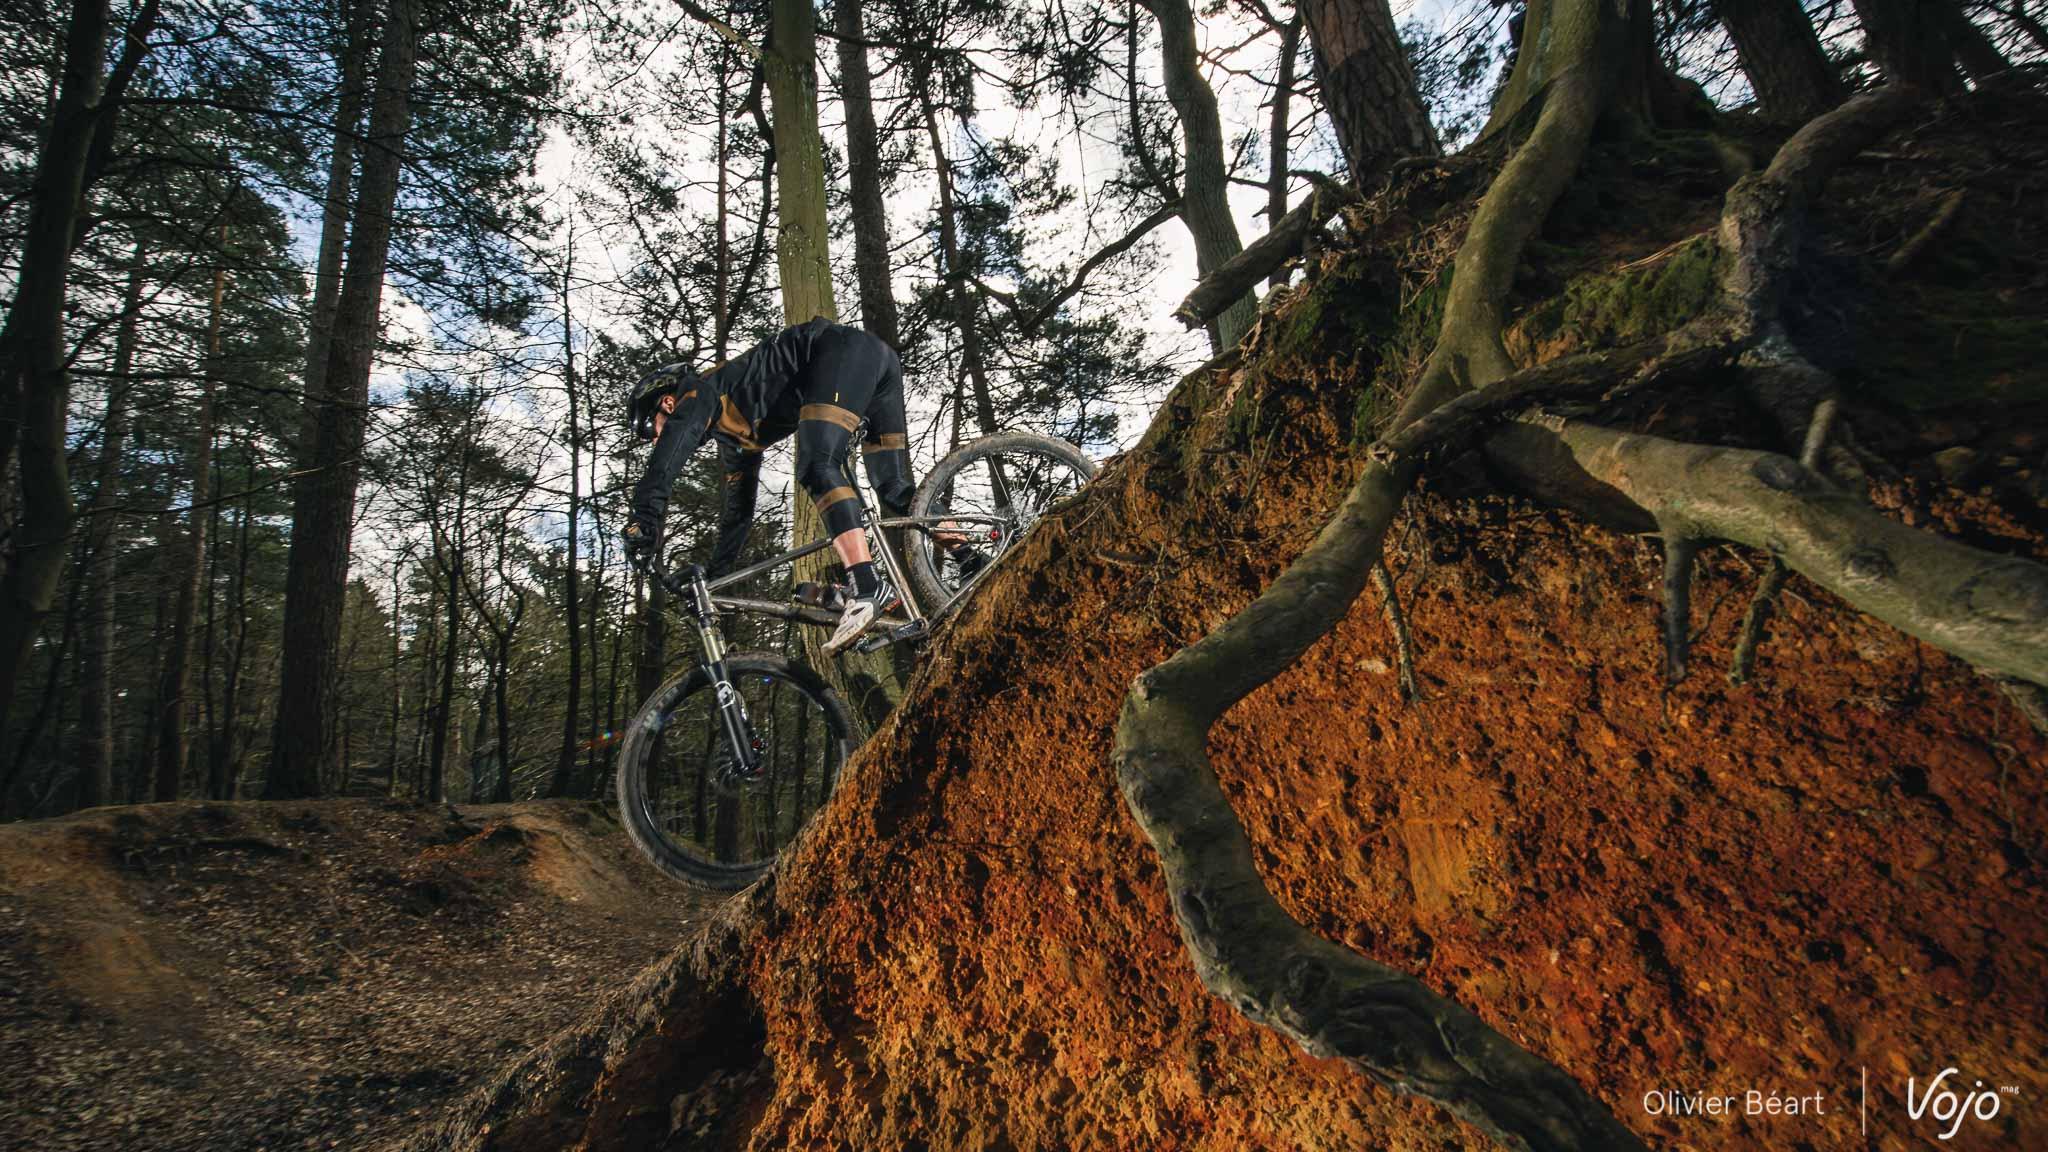 cycles_leon_decouverte_copyright_obeart_vojomag-55